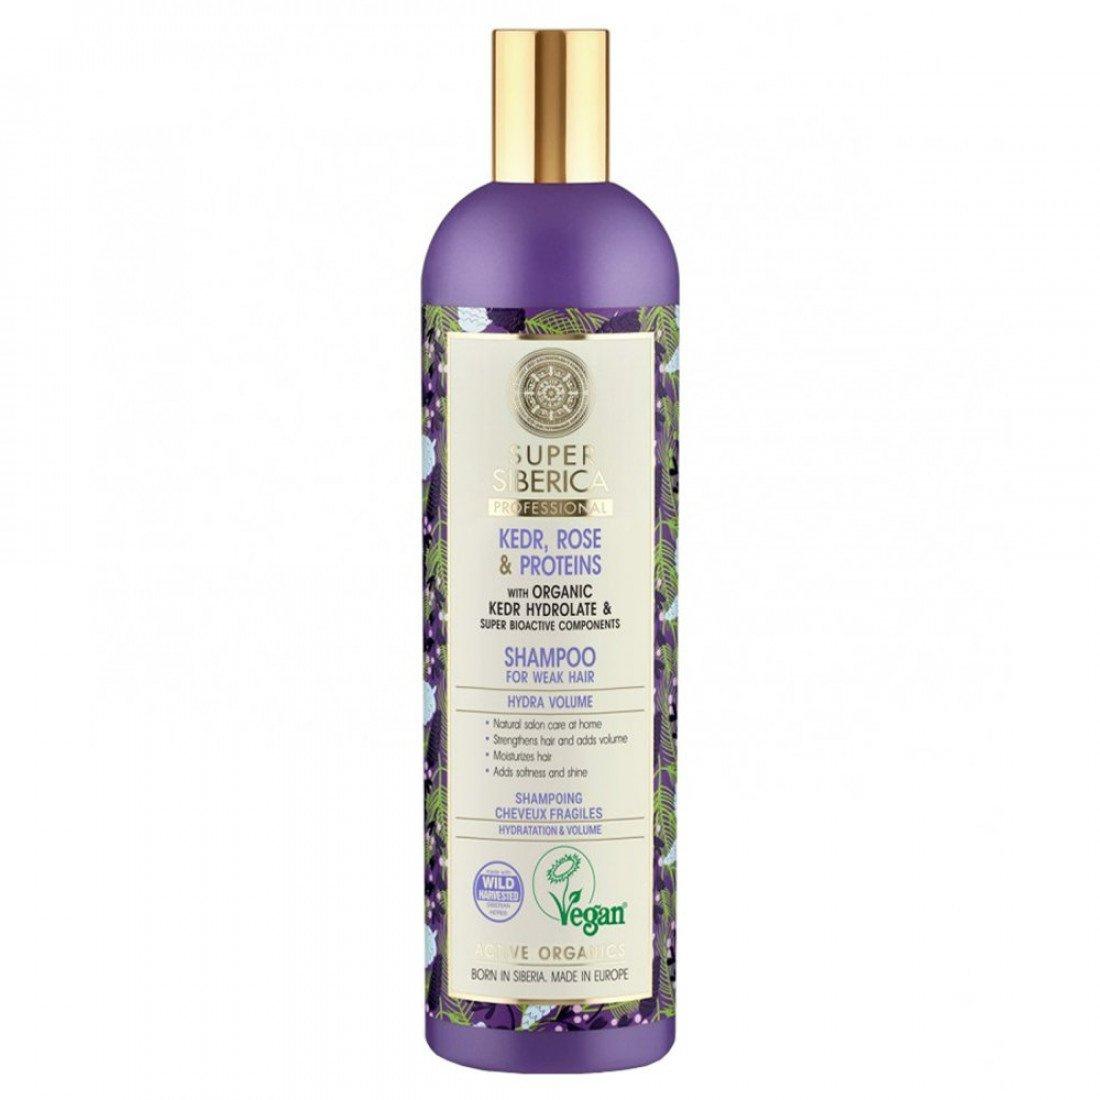 Natura Siberica Super Siberica Kedr, Rose & Proteins Shampoo